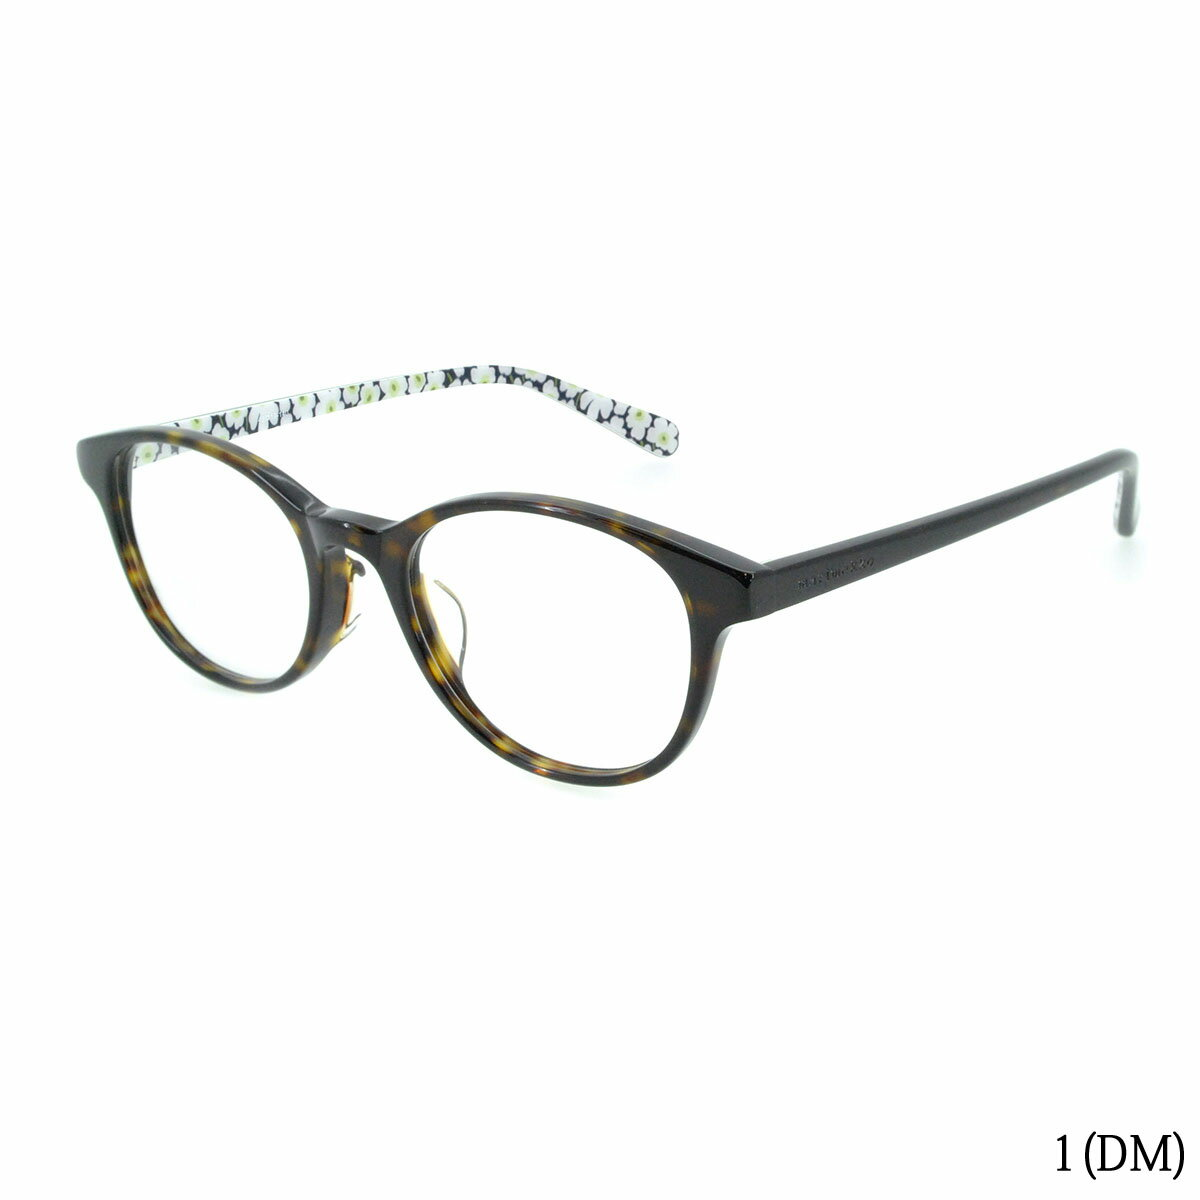 marimekko マリメッコ MINI UNIKKO ミニウニッコ 32-0026 メガネ/めがね/眼鏡/度付きメガネ/度入り/伊達メガネ